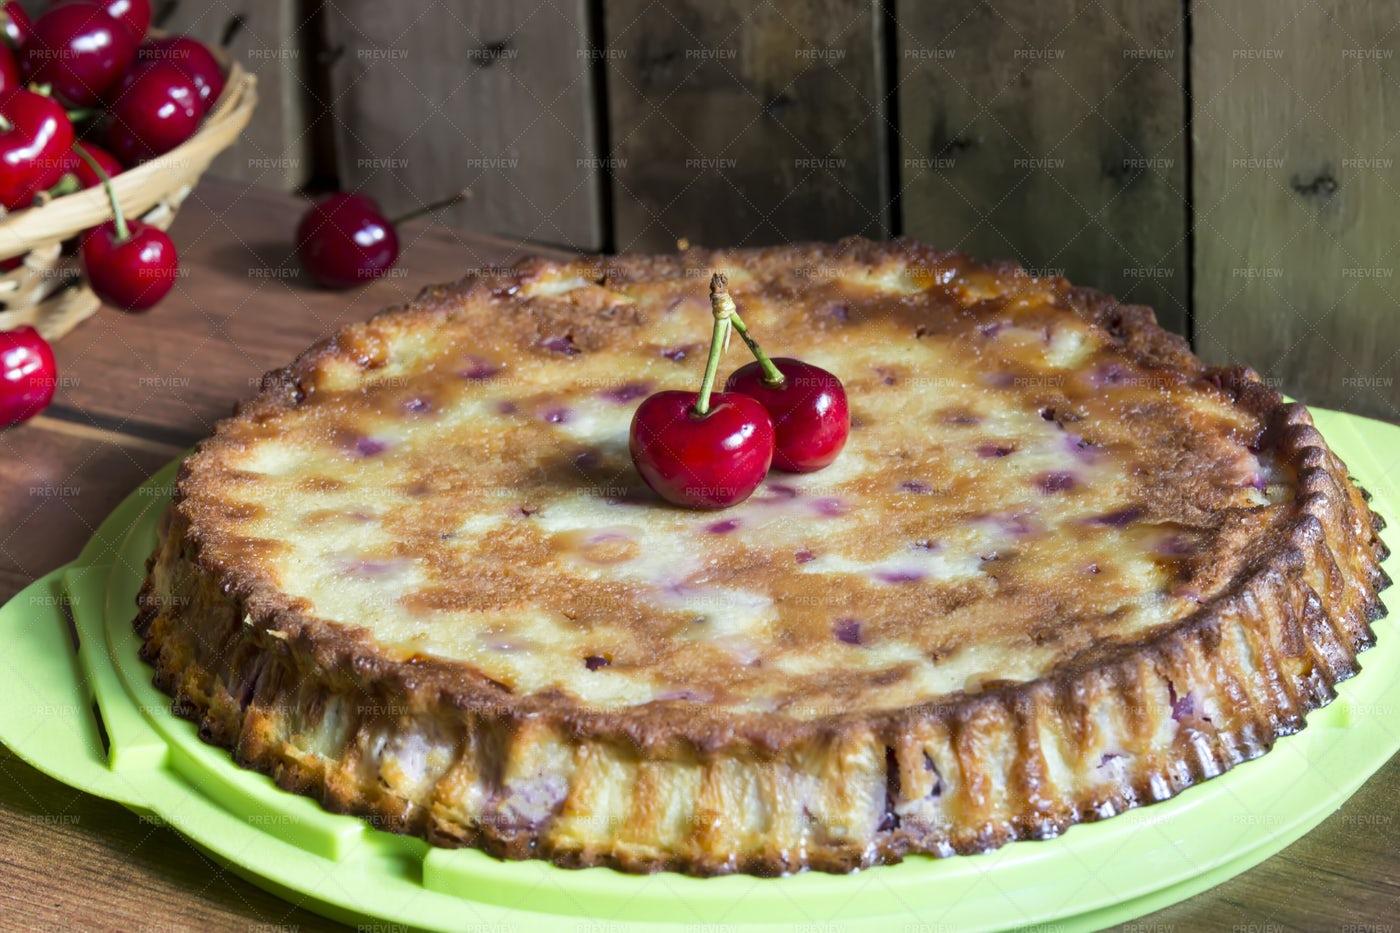 Homemade Cherry French Cake: Stock Photos